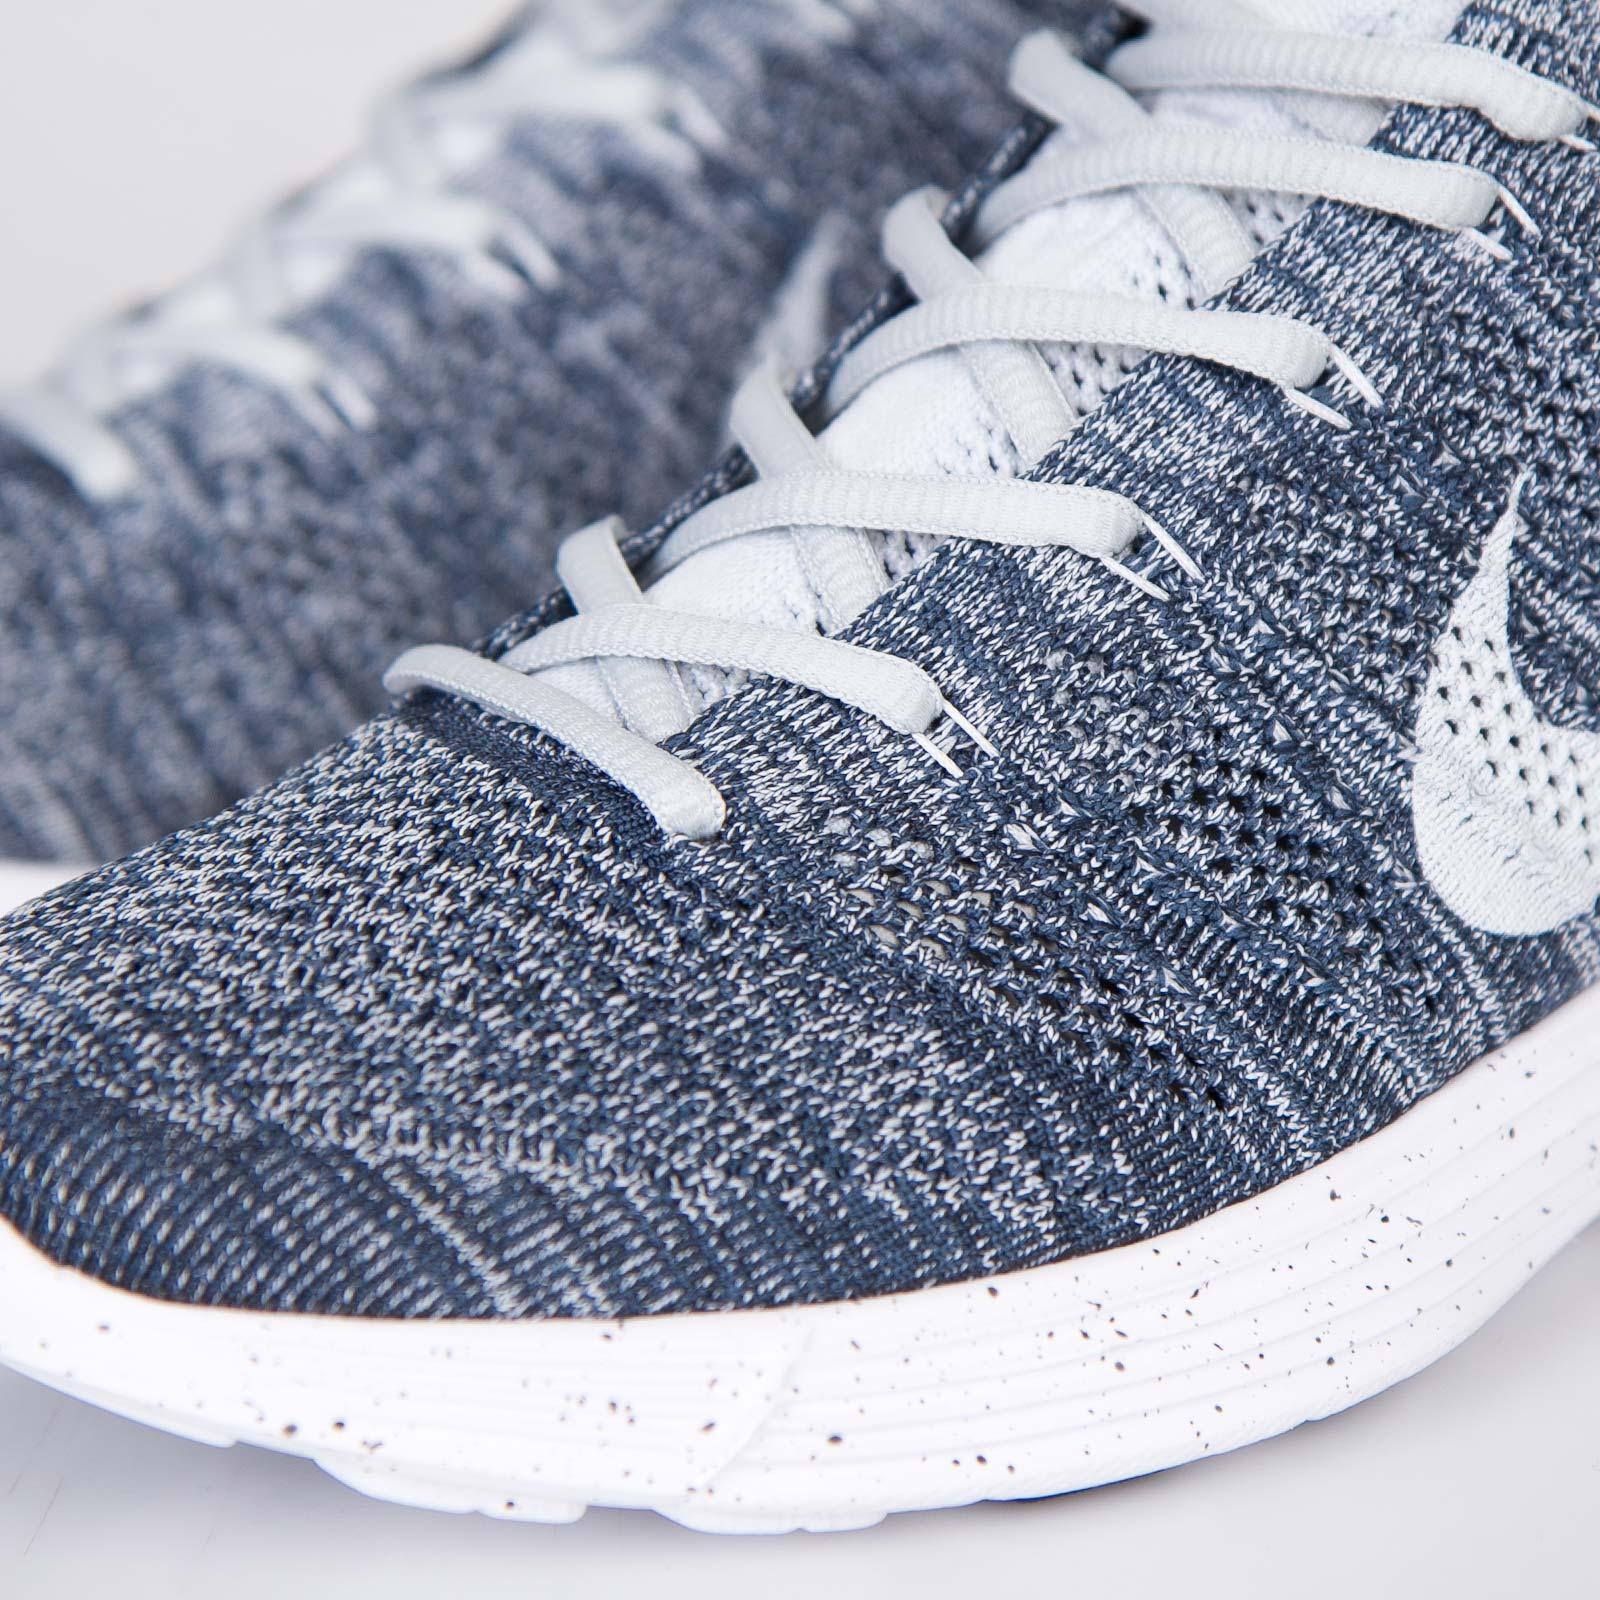 69ec607c01b6 Nike Lunar Flyknit Chukka - 554969-400 - Sneakersnstuff